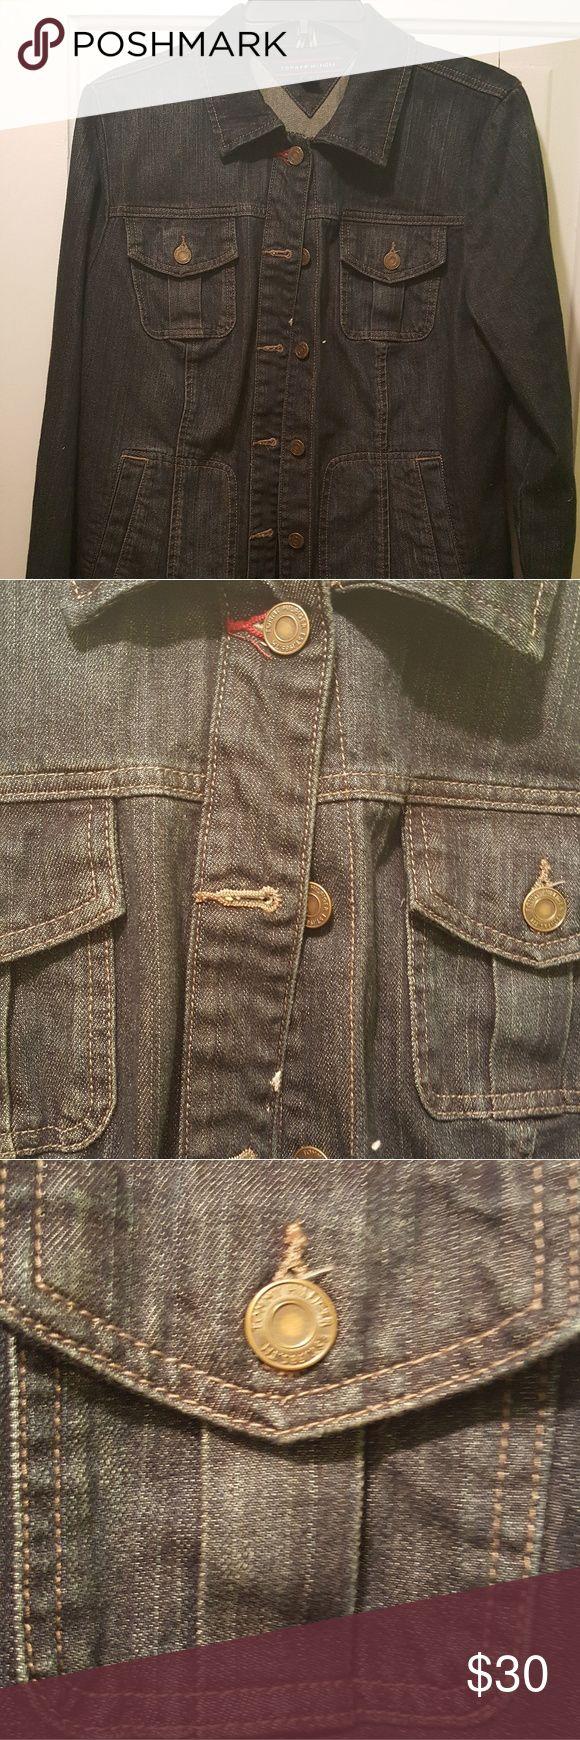 Tommy Hilfiger Jean Jacket Tommy Jean Jacket size large, worn one time, stored in a smoke free home Tommy Hilfiger Jackets & Coats Jean Jackets